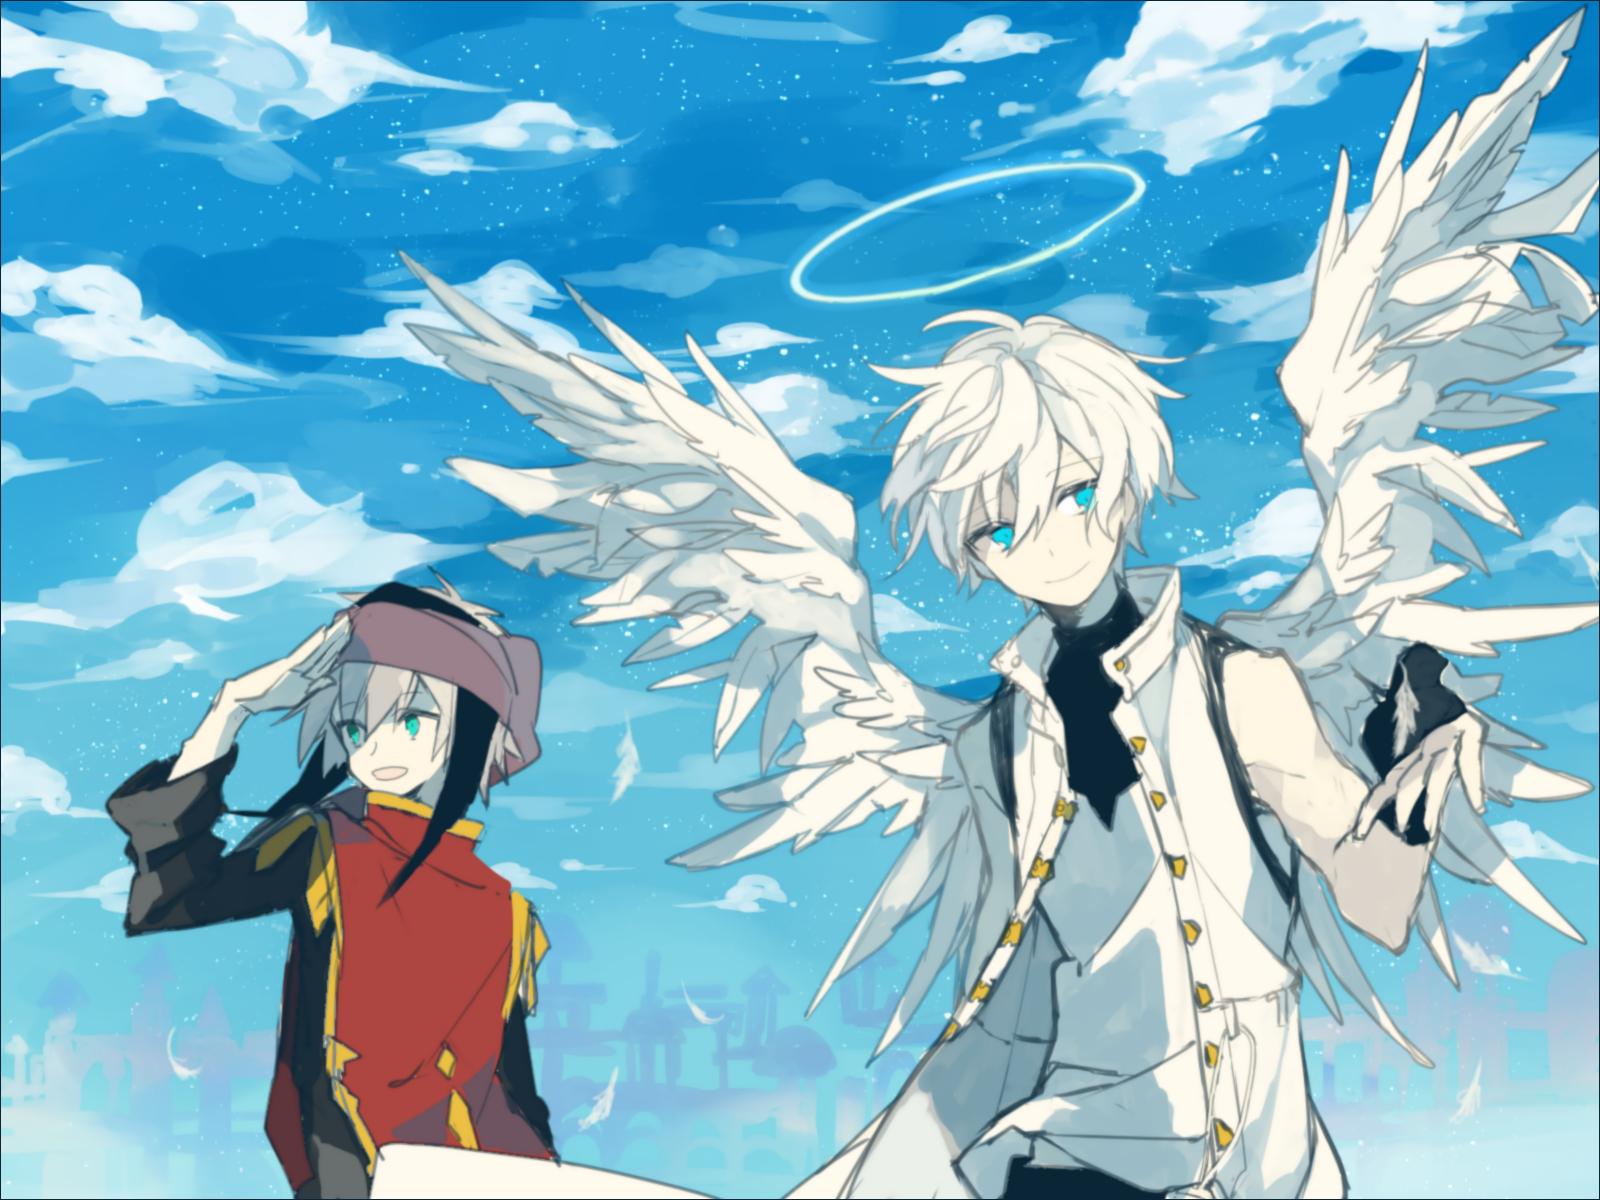 Merc Storia - Zerochan Anime Image Board